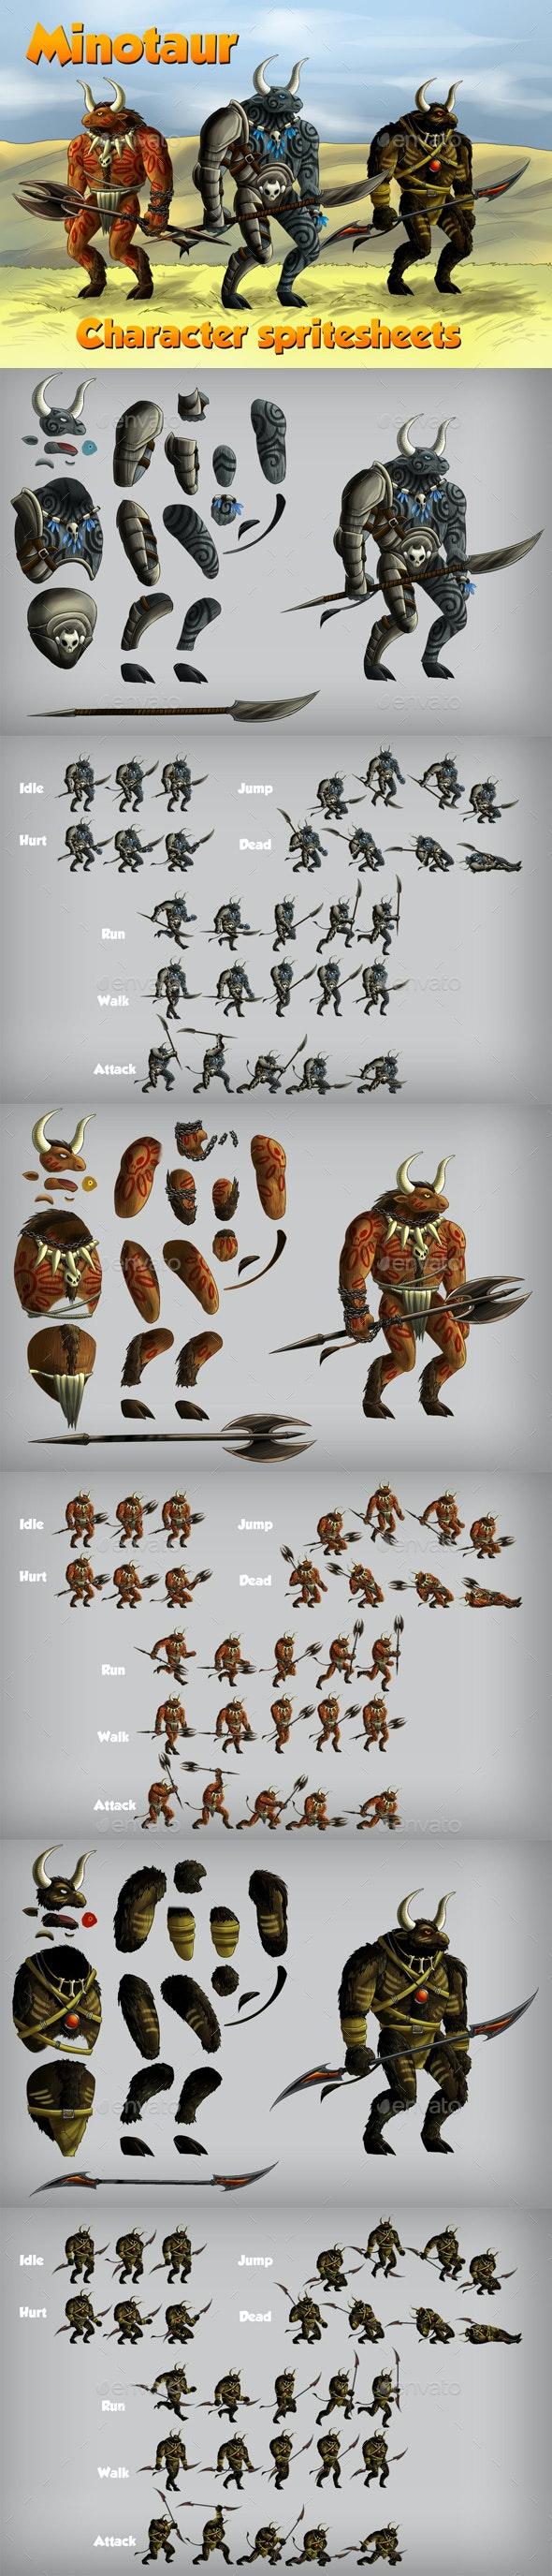 2D Game Minotaur Character Spritesheet - Sprites Game Assets